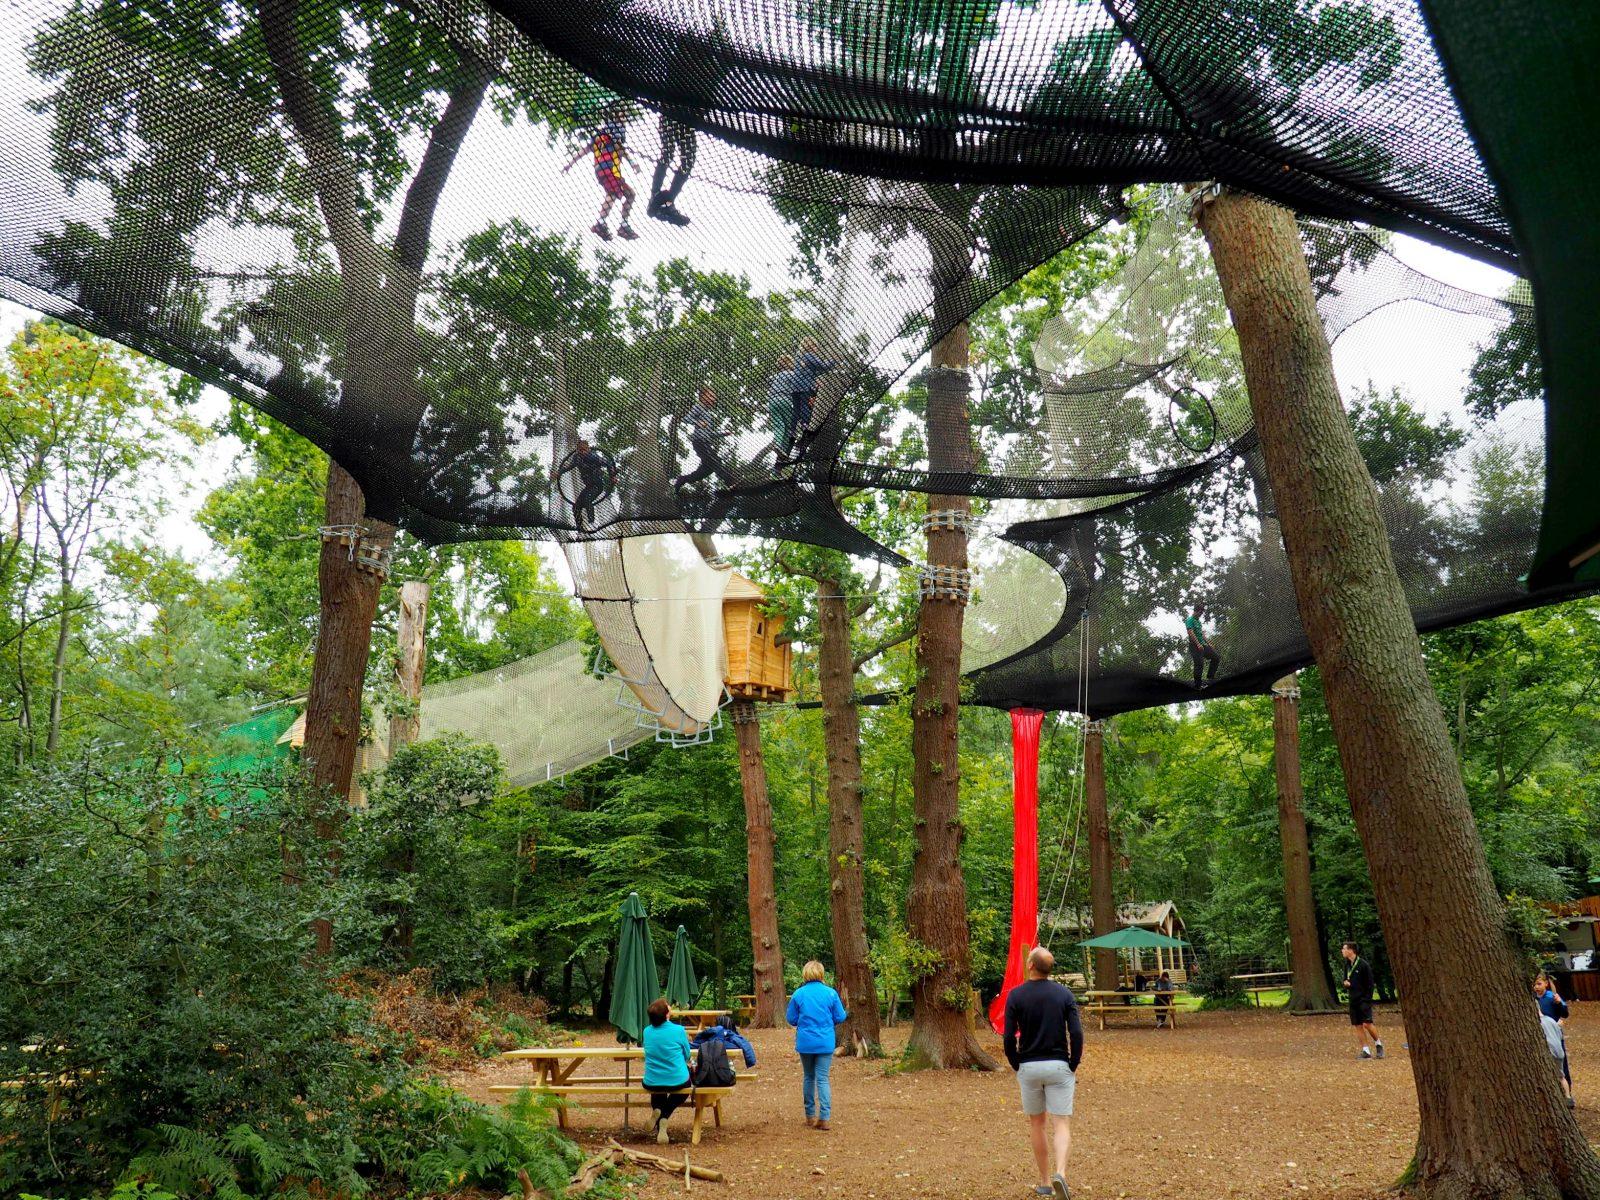 A day at Go Ape Black Park 'Nets Kingdom' – A Review